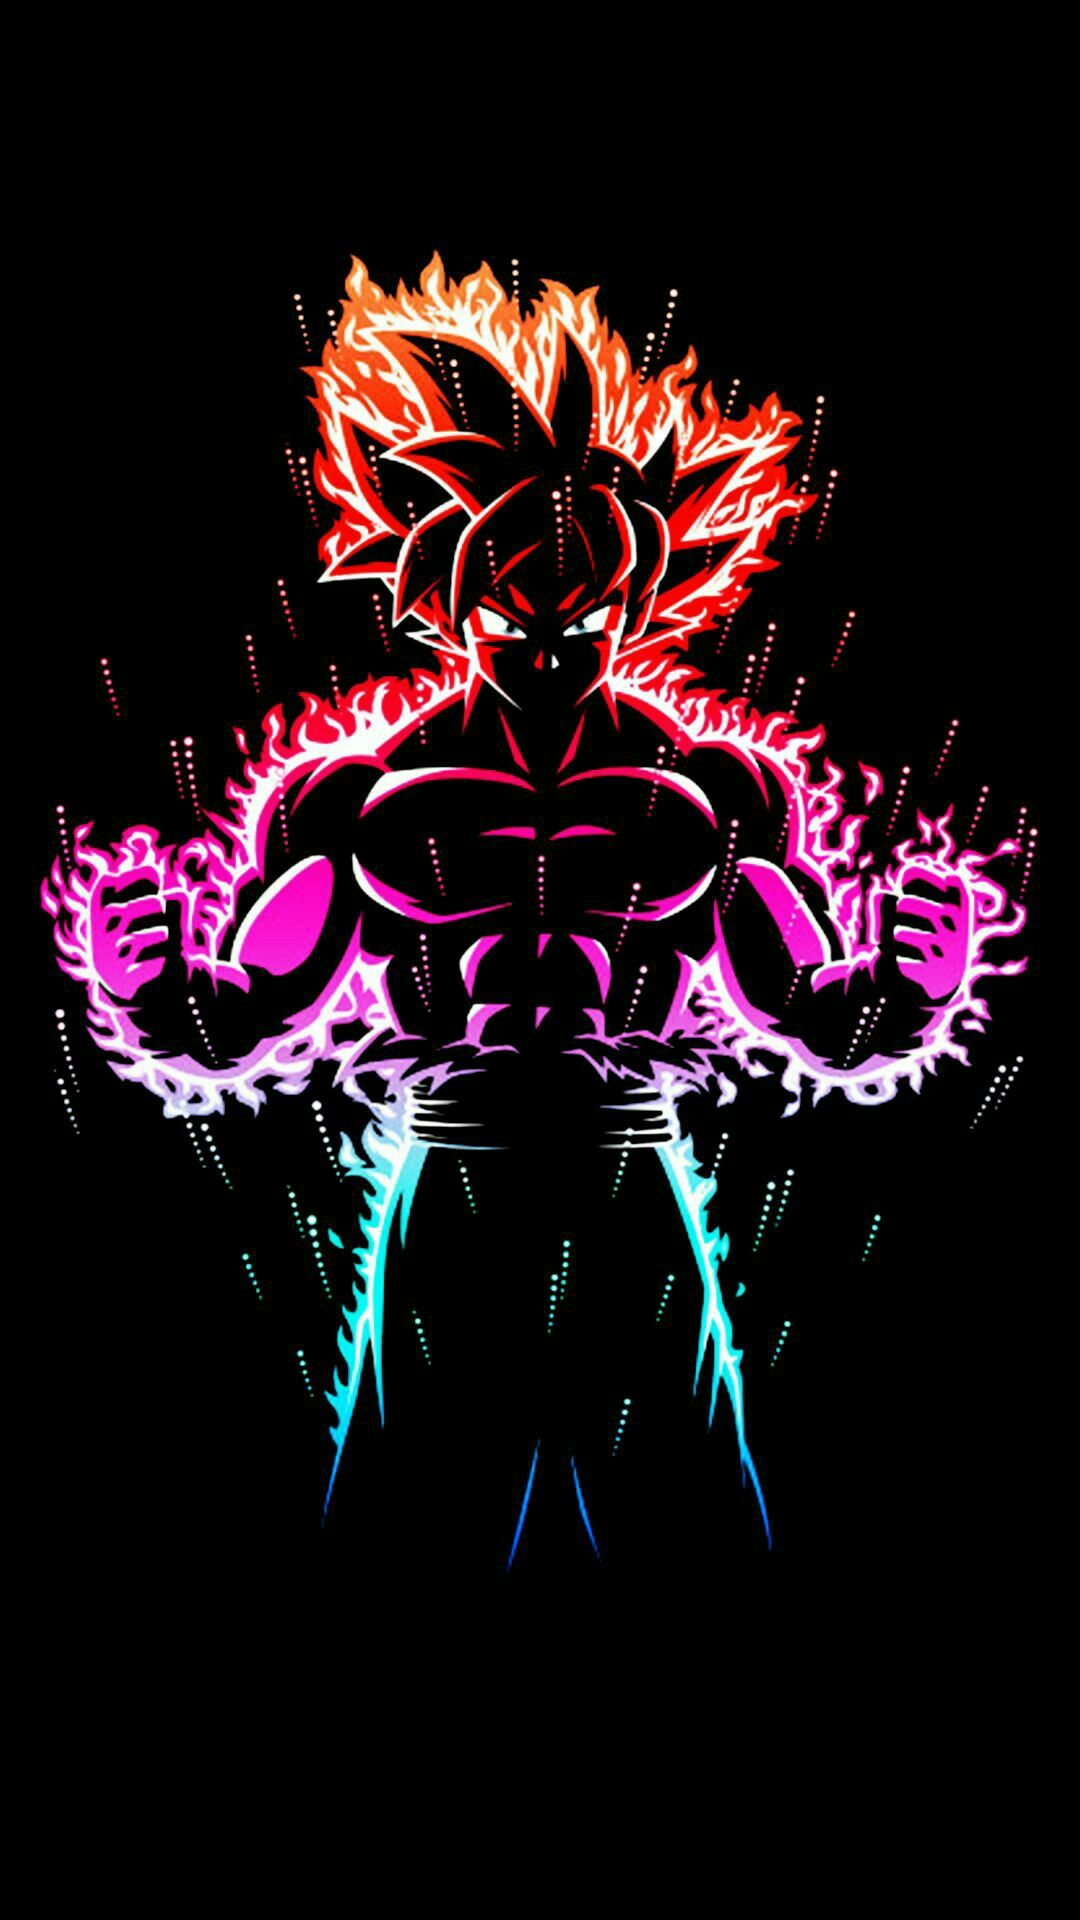 Son Goku Migatte No Gokui Wallpaper Android Hd Dragon Ball Z Fond D Ecran Telephone Fond D Ecran Goku